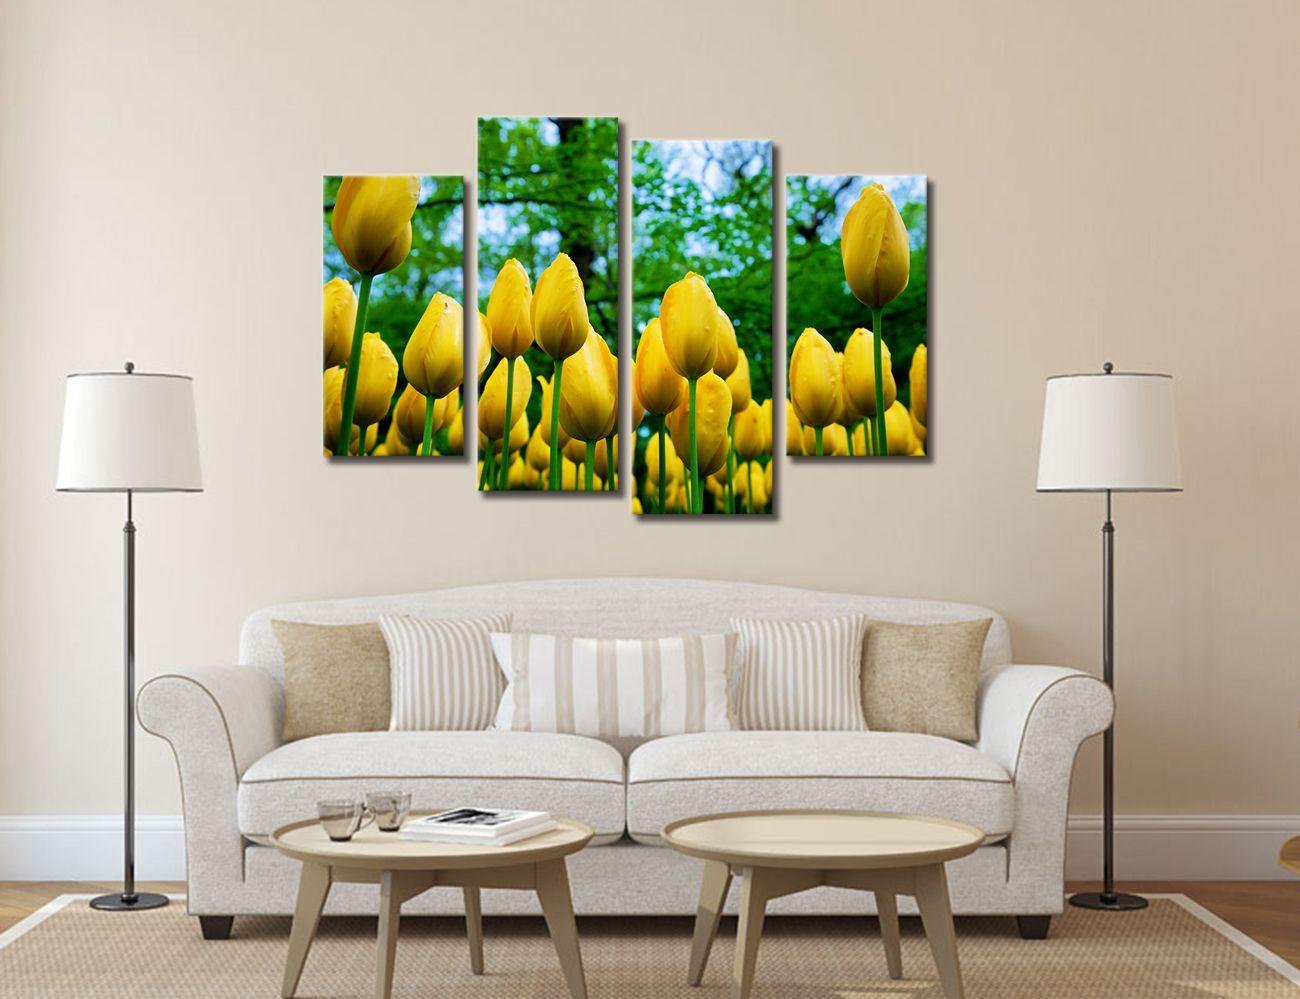 Golden Tulip Flower Painting on Canvas Non Frame Modern Giclee Print Living Room Wall Decor 30cmx60cmx2 30cmx80cmx2